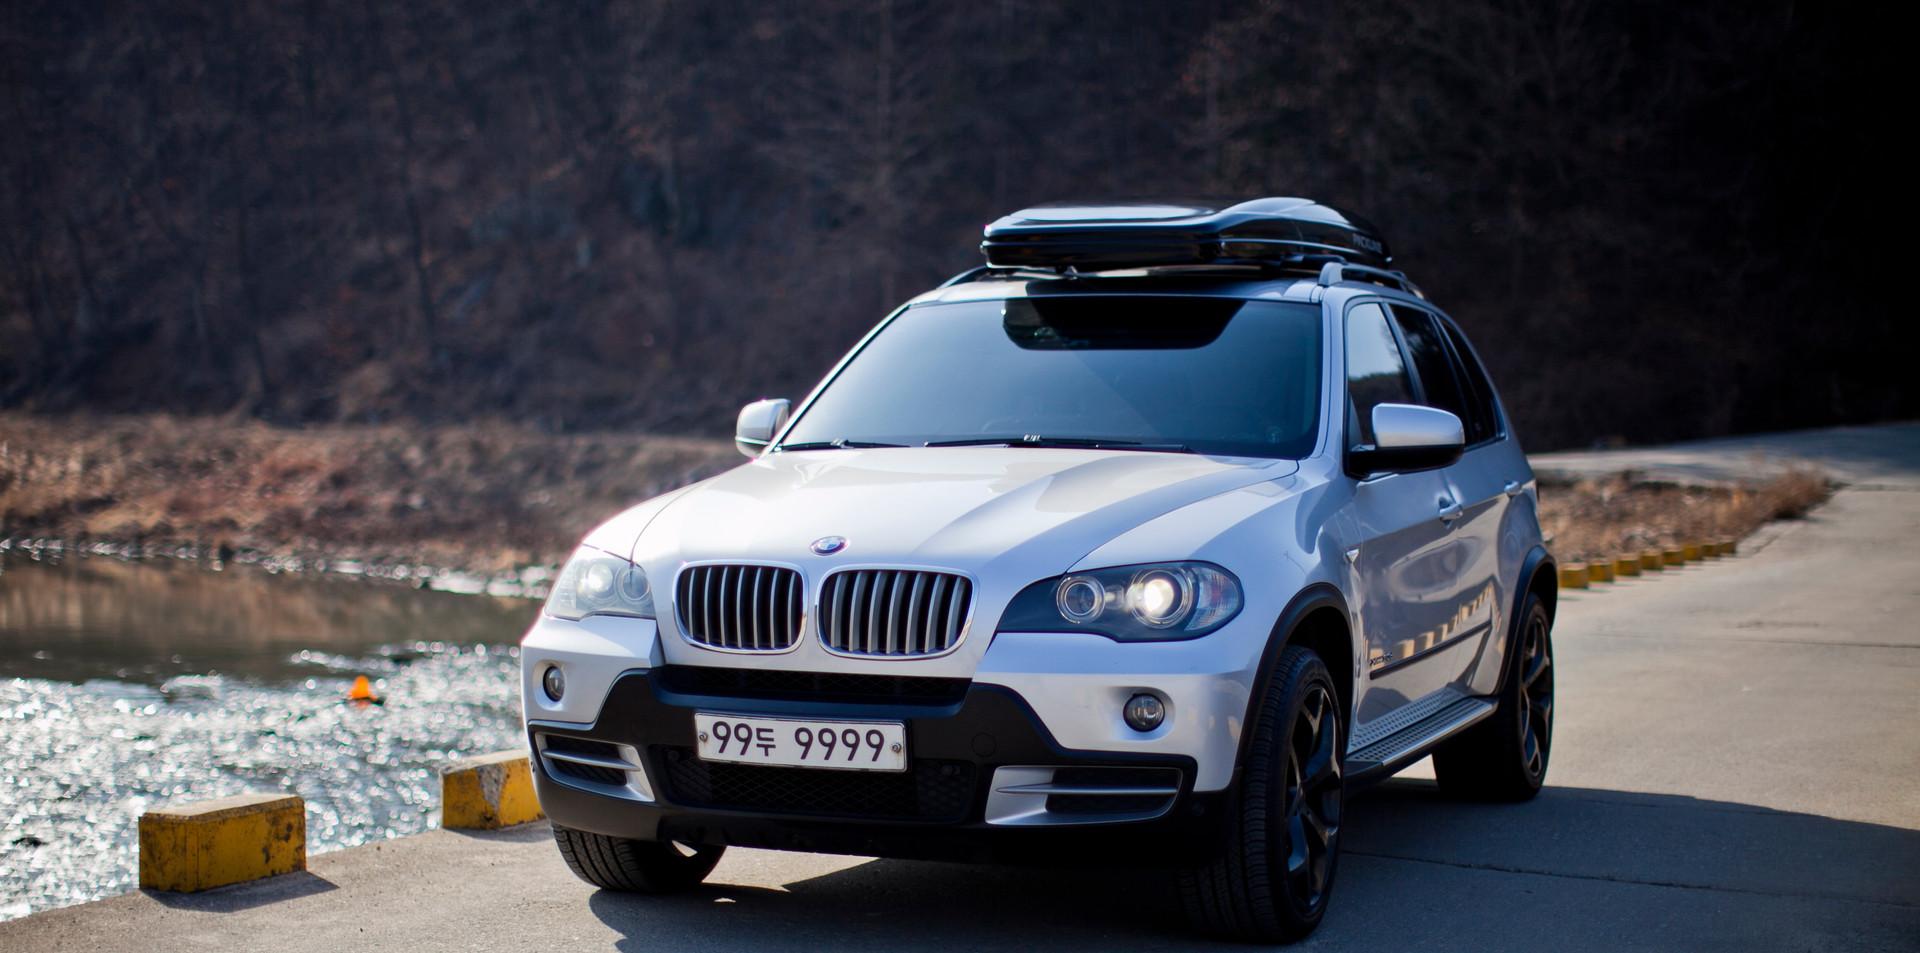 BMW_X5_FX-SUV-03.jpg